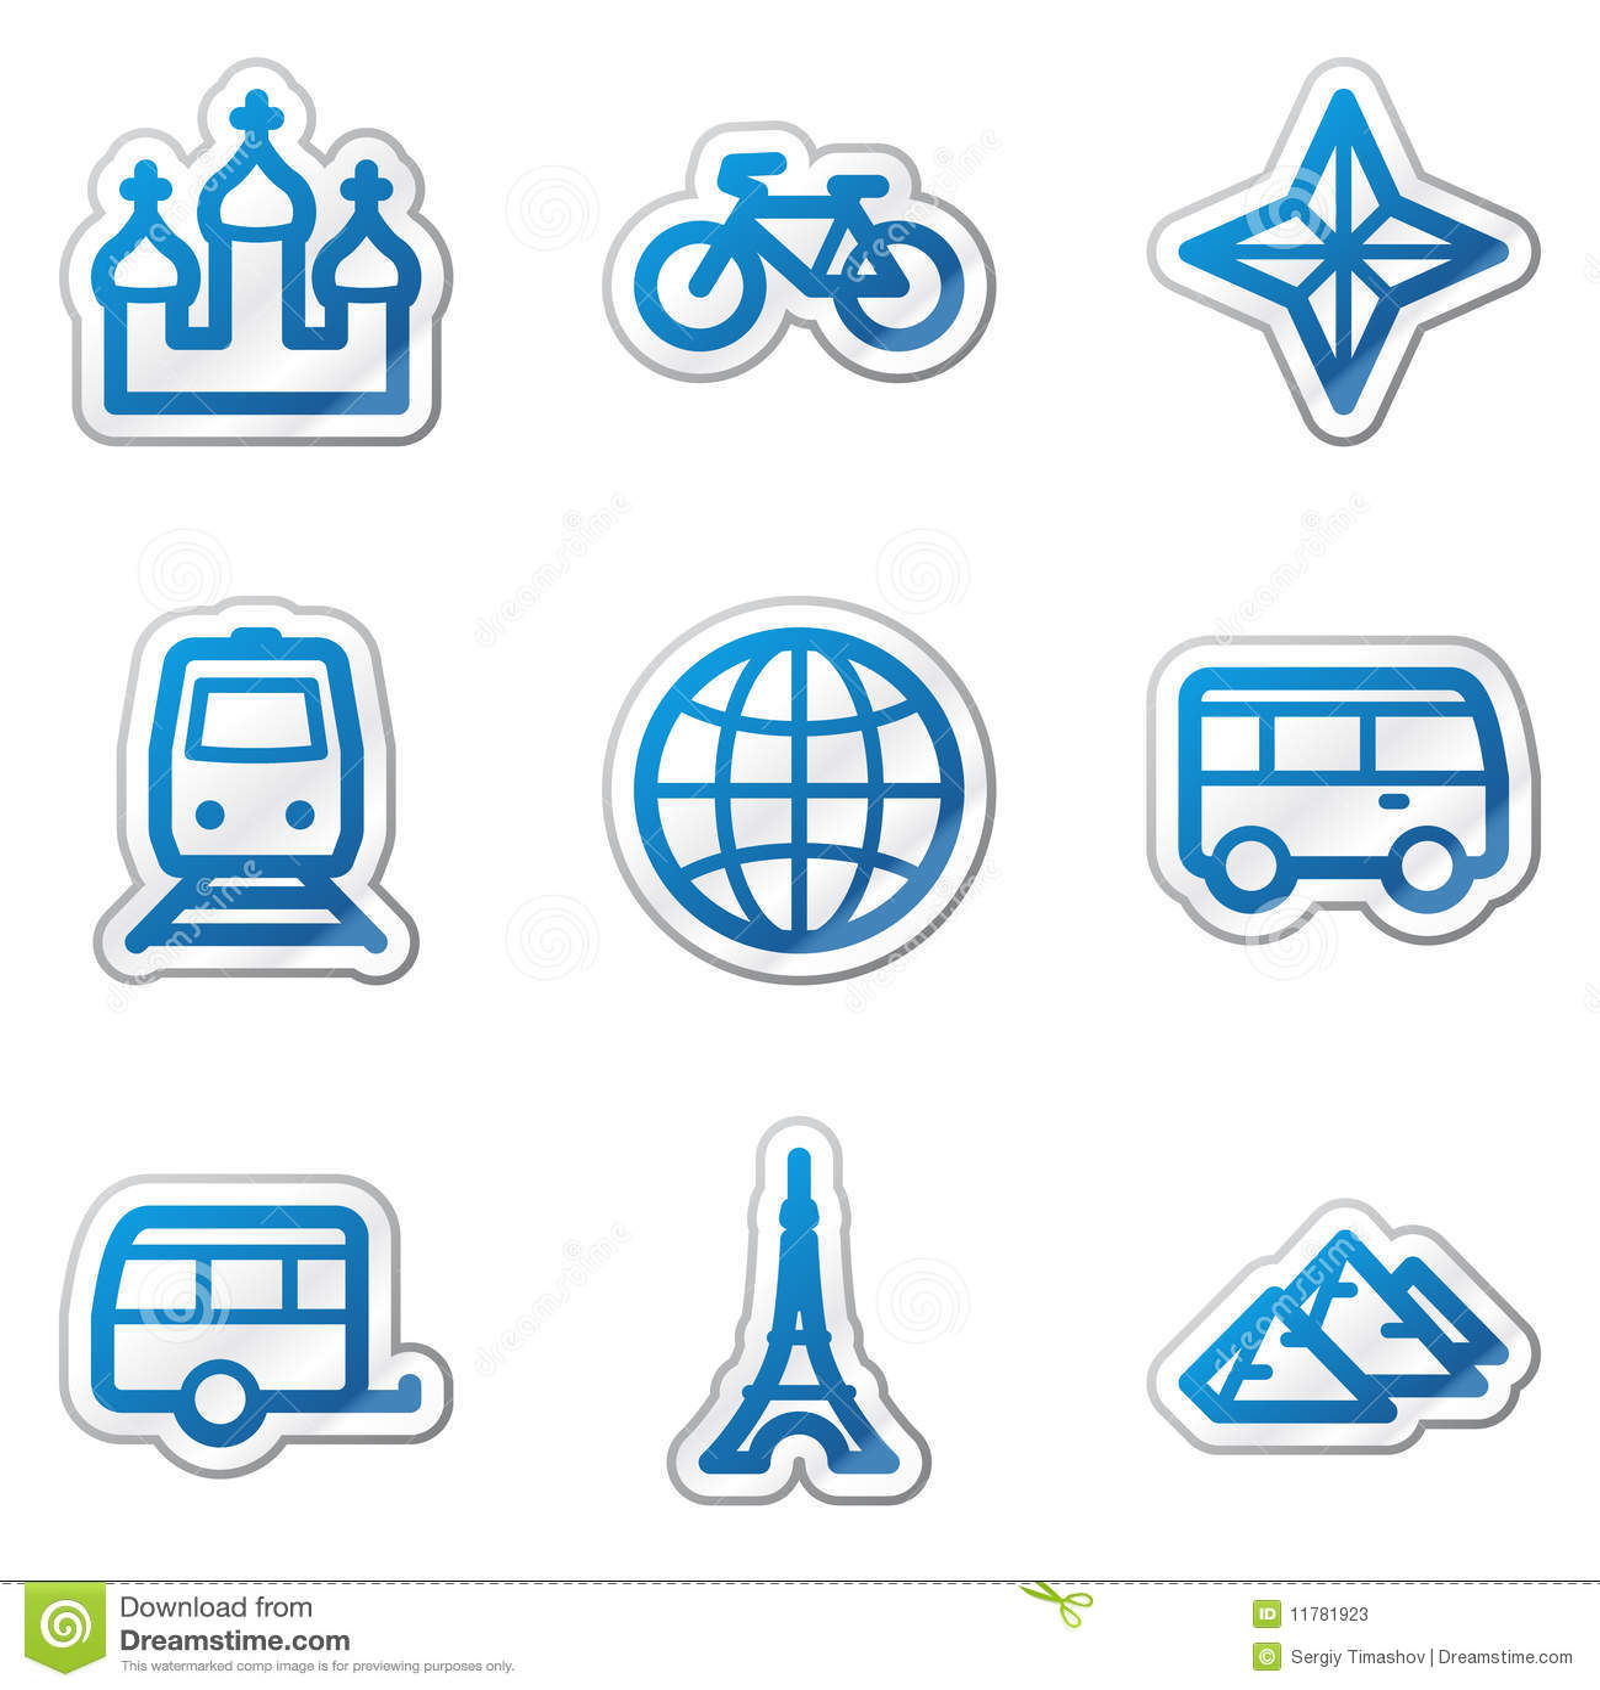 Travel web icons set 2, blue contour sticker